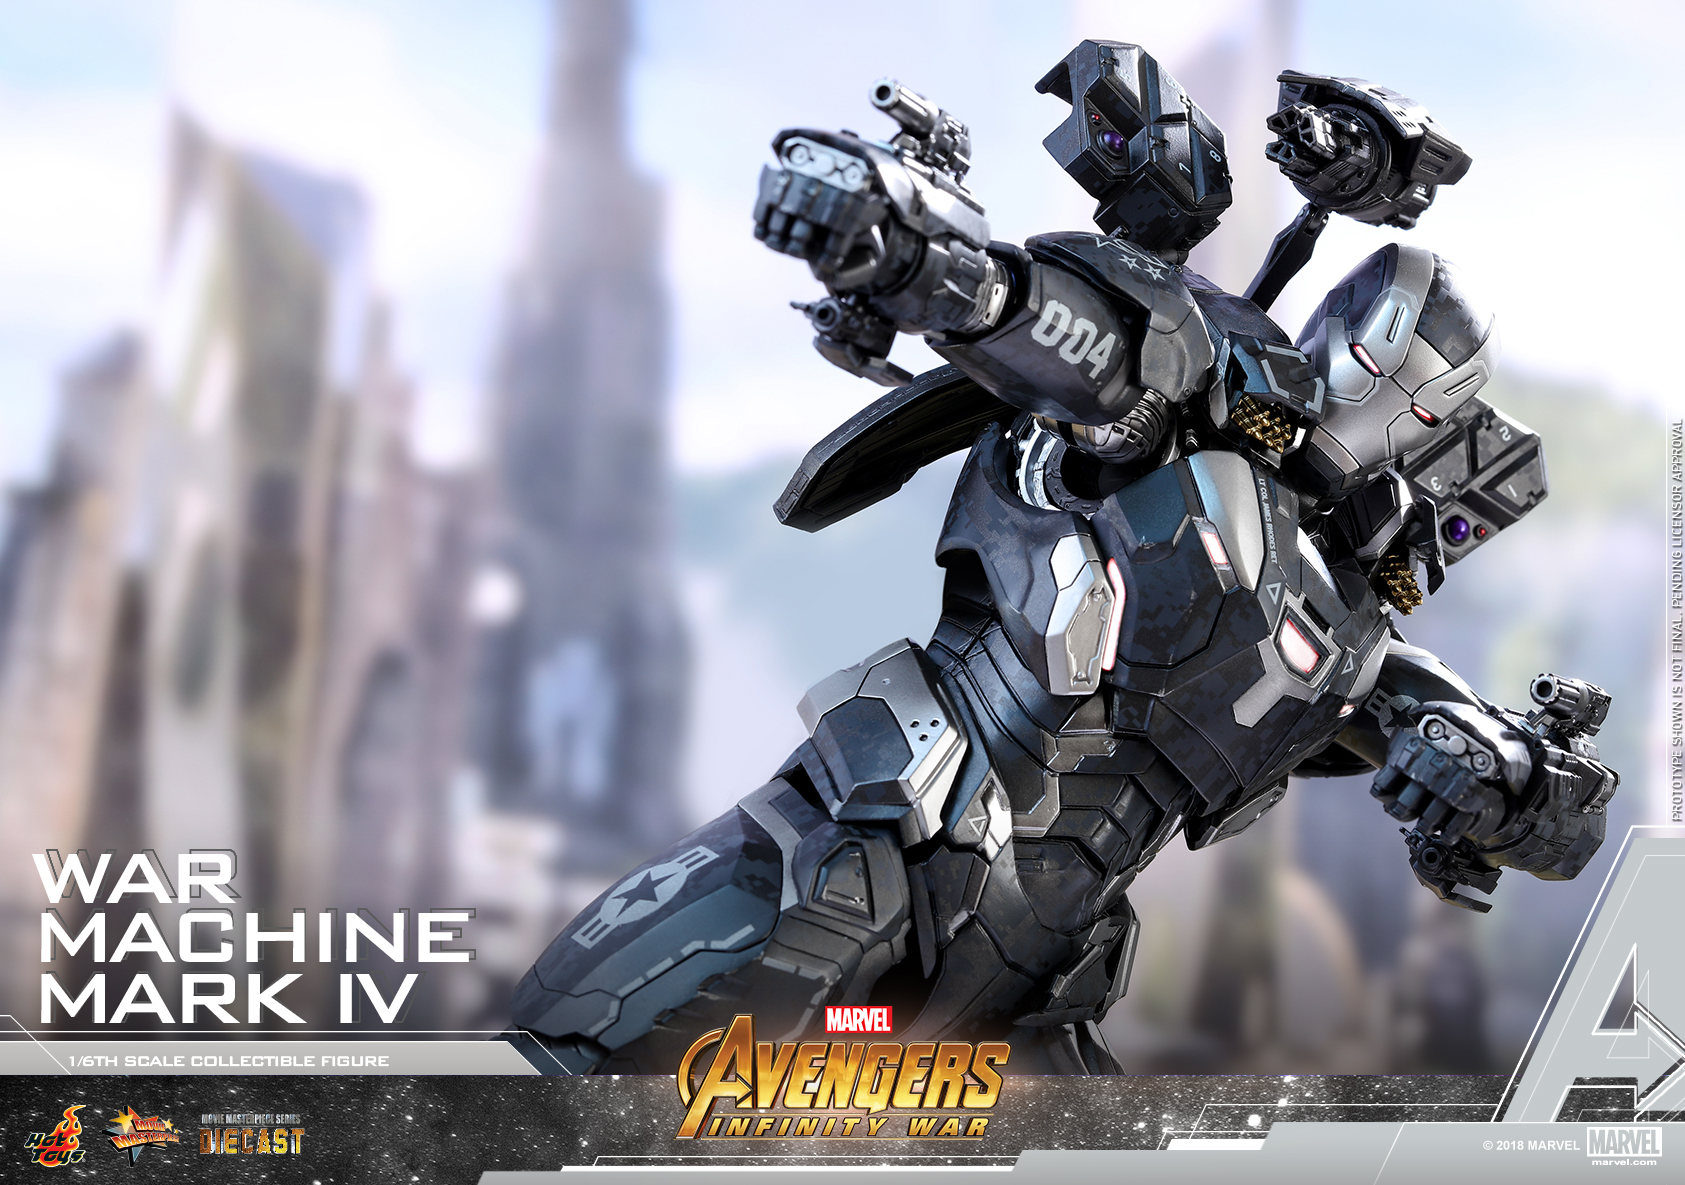 Hot Toys - Avengers 3 - War Machine Mark IV (Diecast) collectible figure_PR12